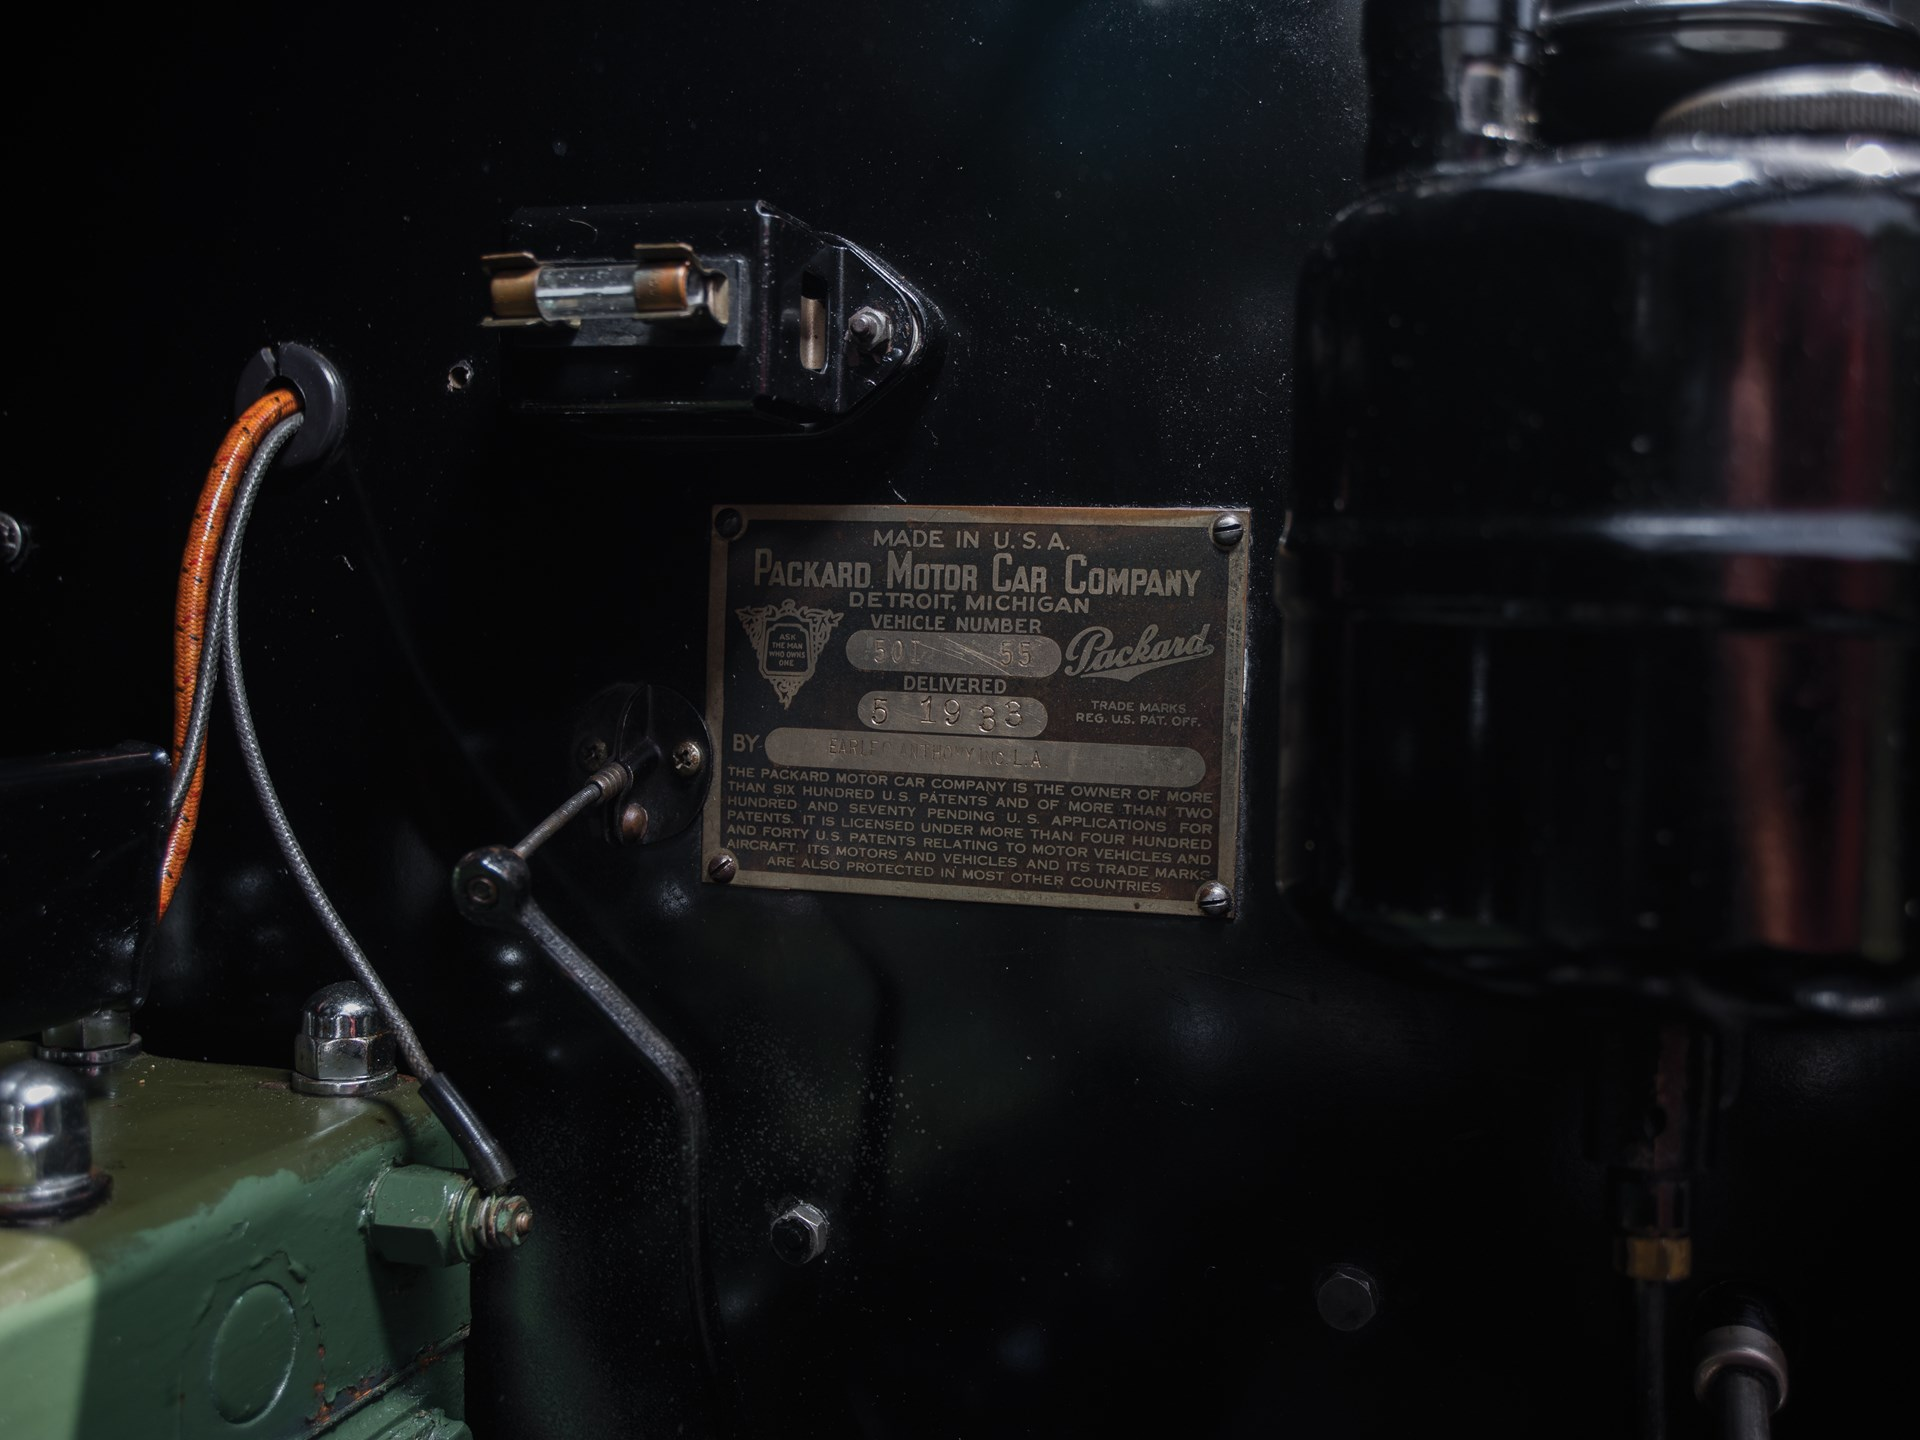 Packard Motor Wiring Diagram Sample 1950 Cadillac Rm Sothebys 1932 Eight Phaeton City 2015 352 V8 Engine